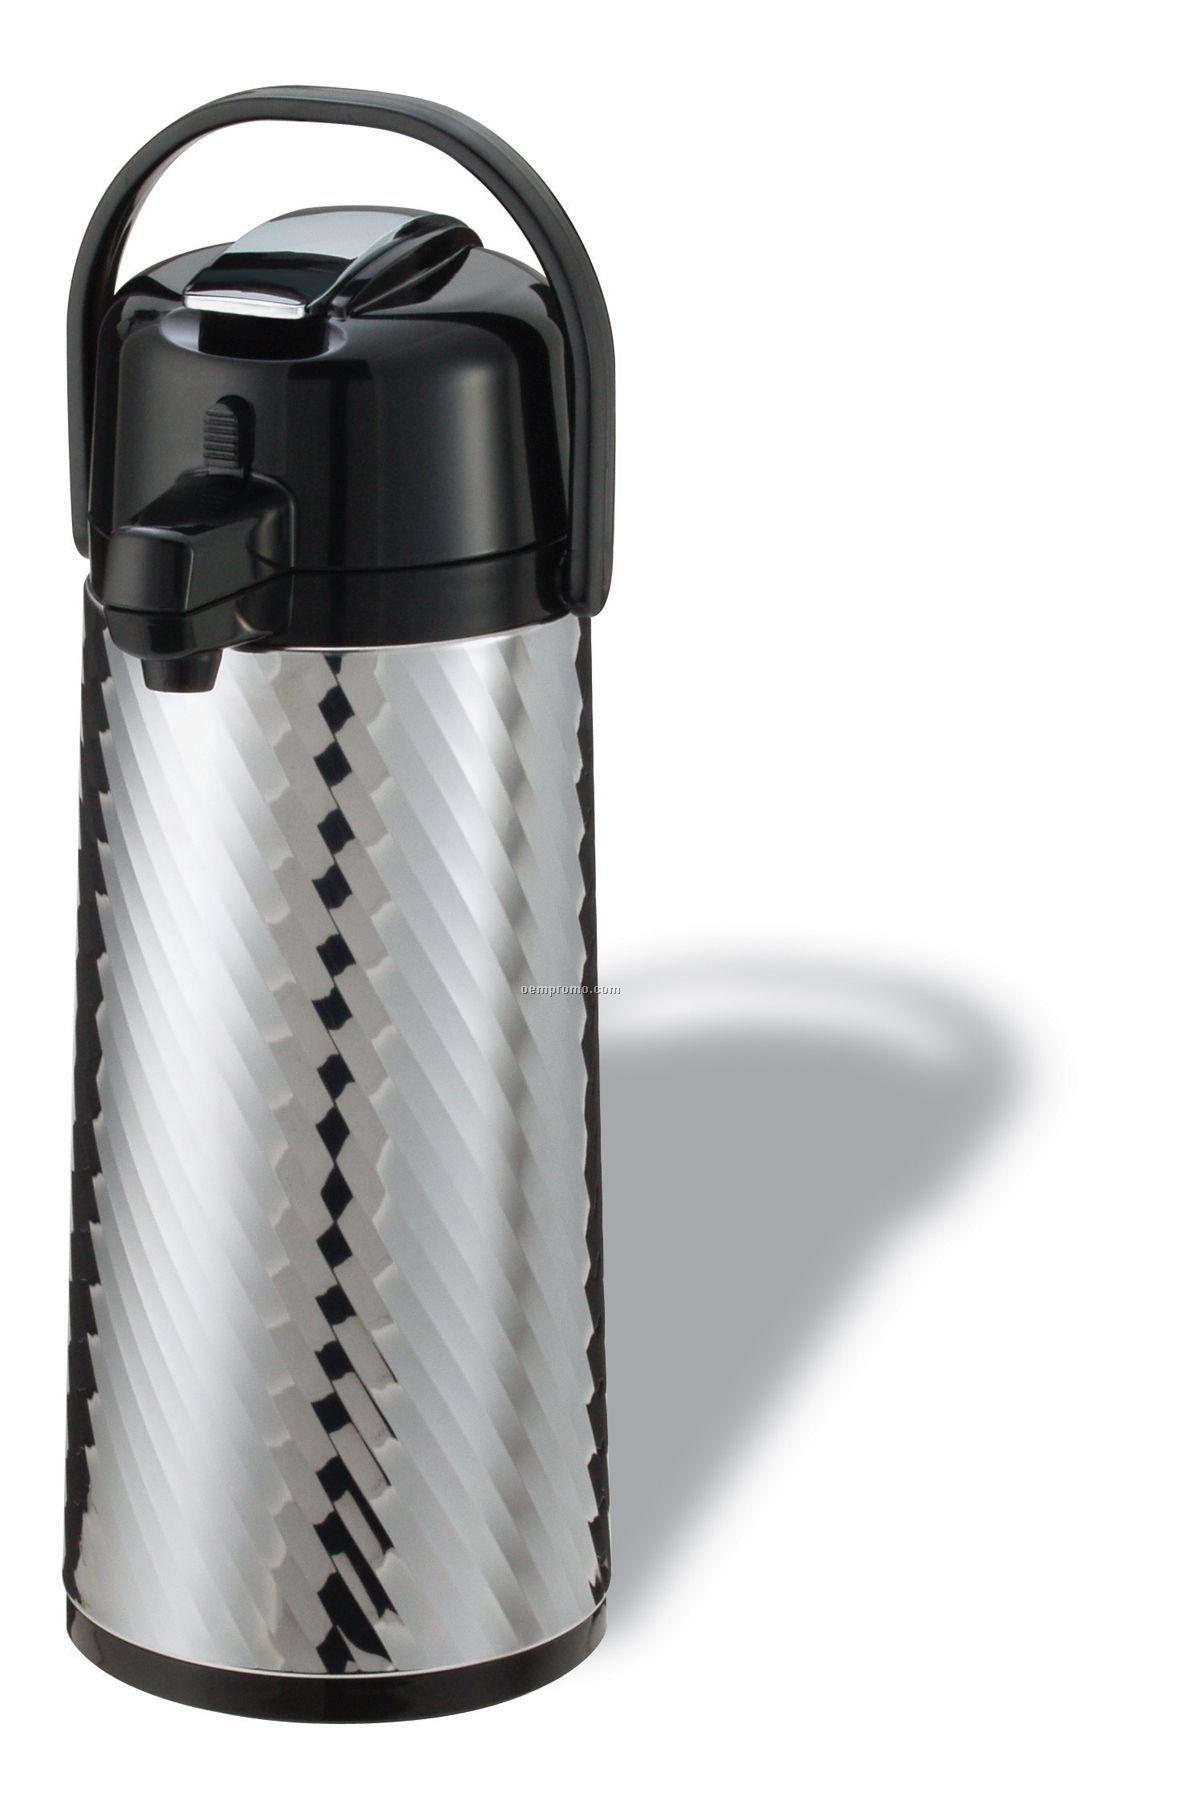 74 2/5 Oz. Liter Jewel Lever Airpot